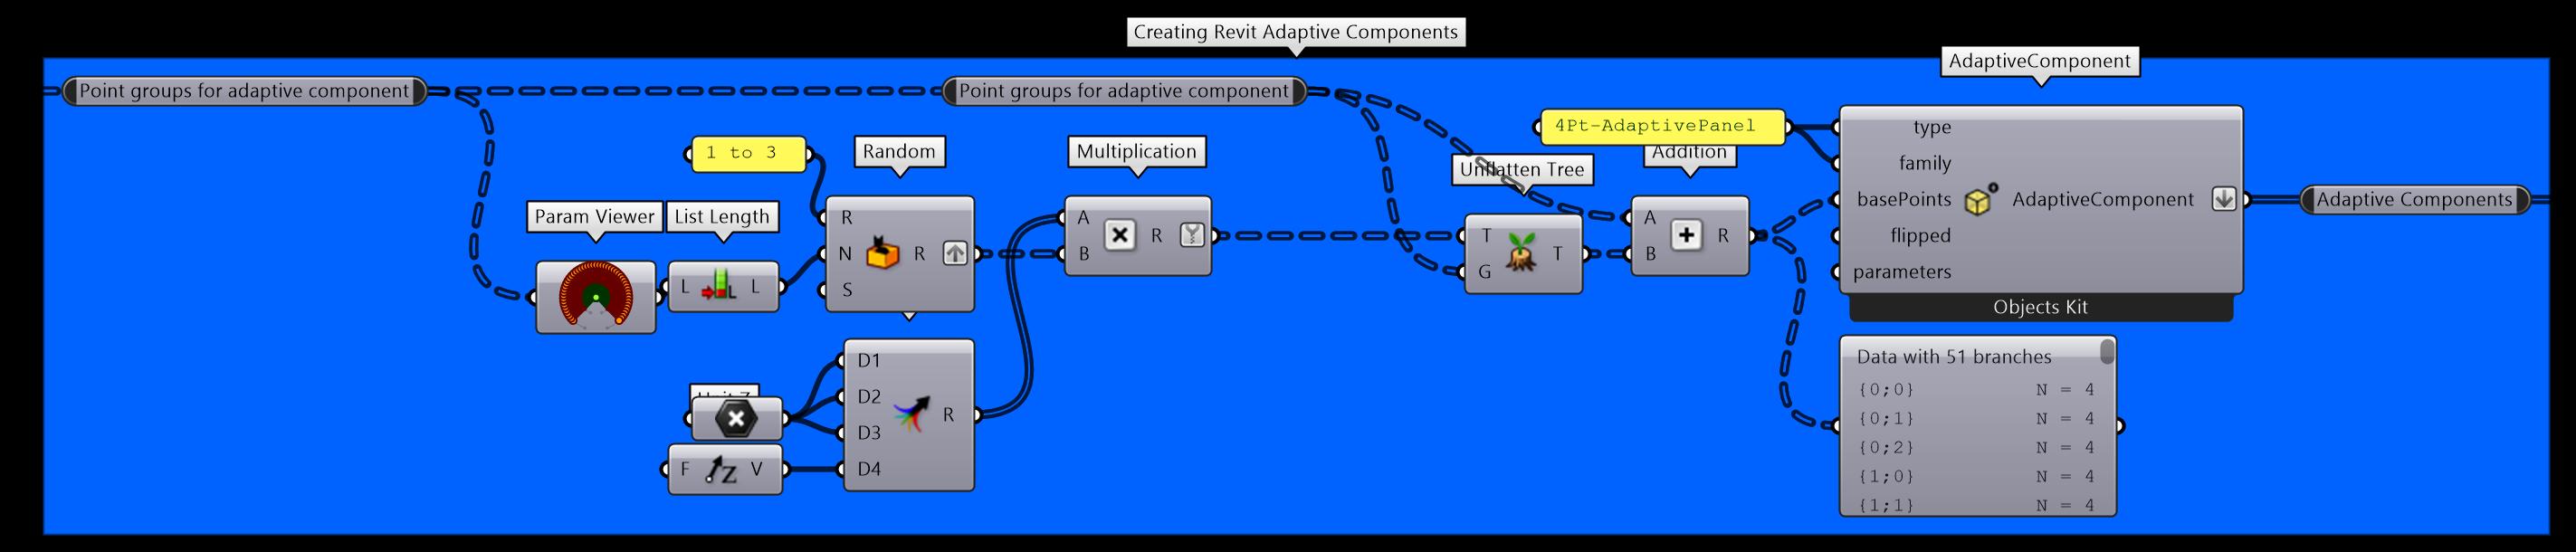 Creating adaptative families